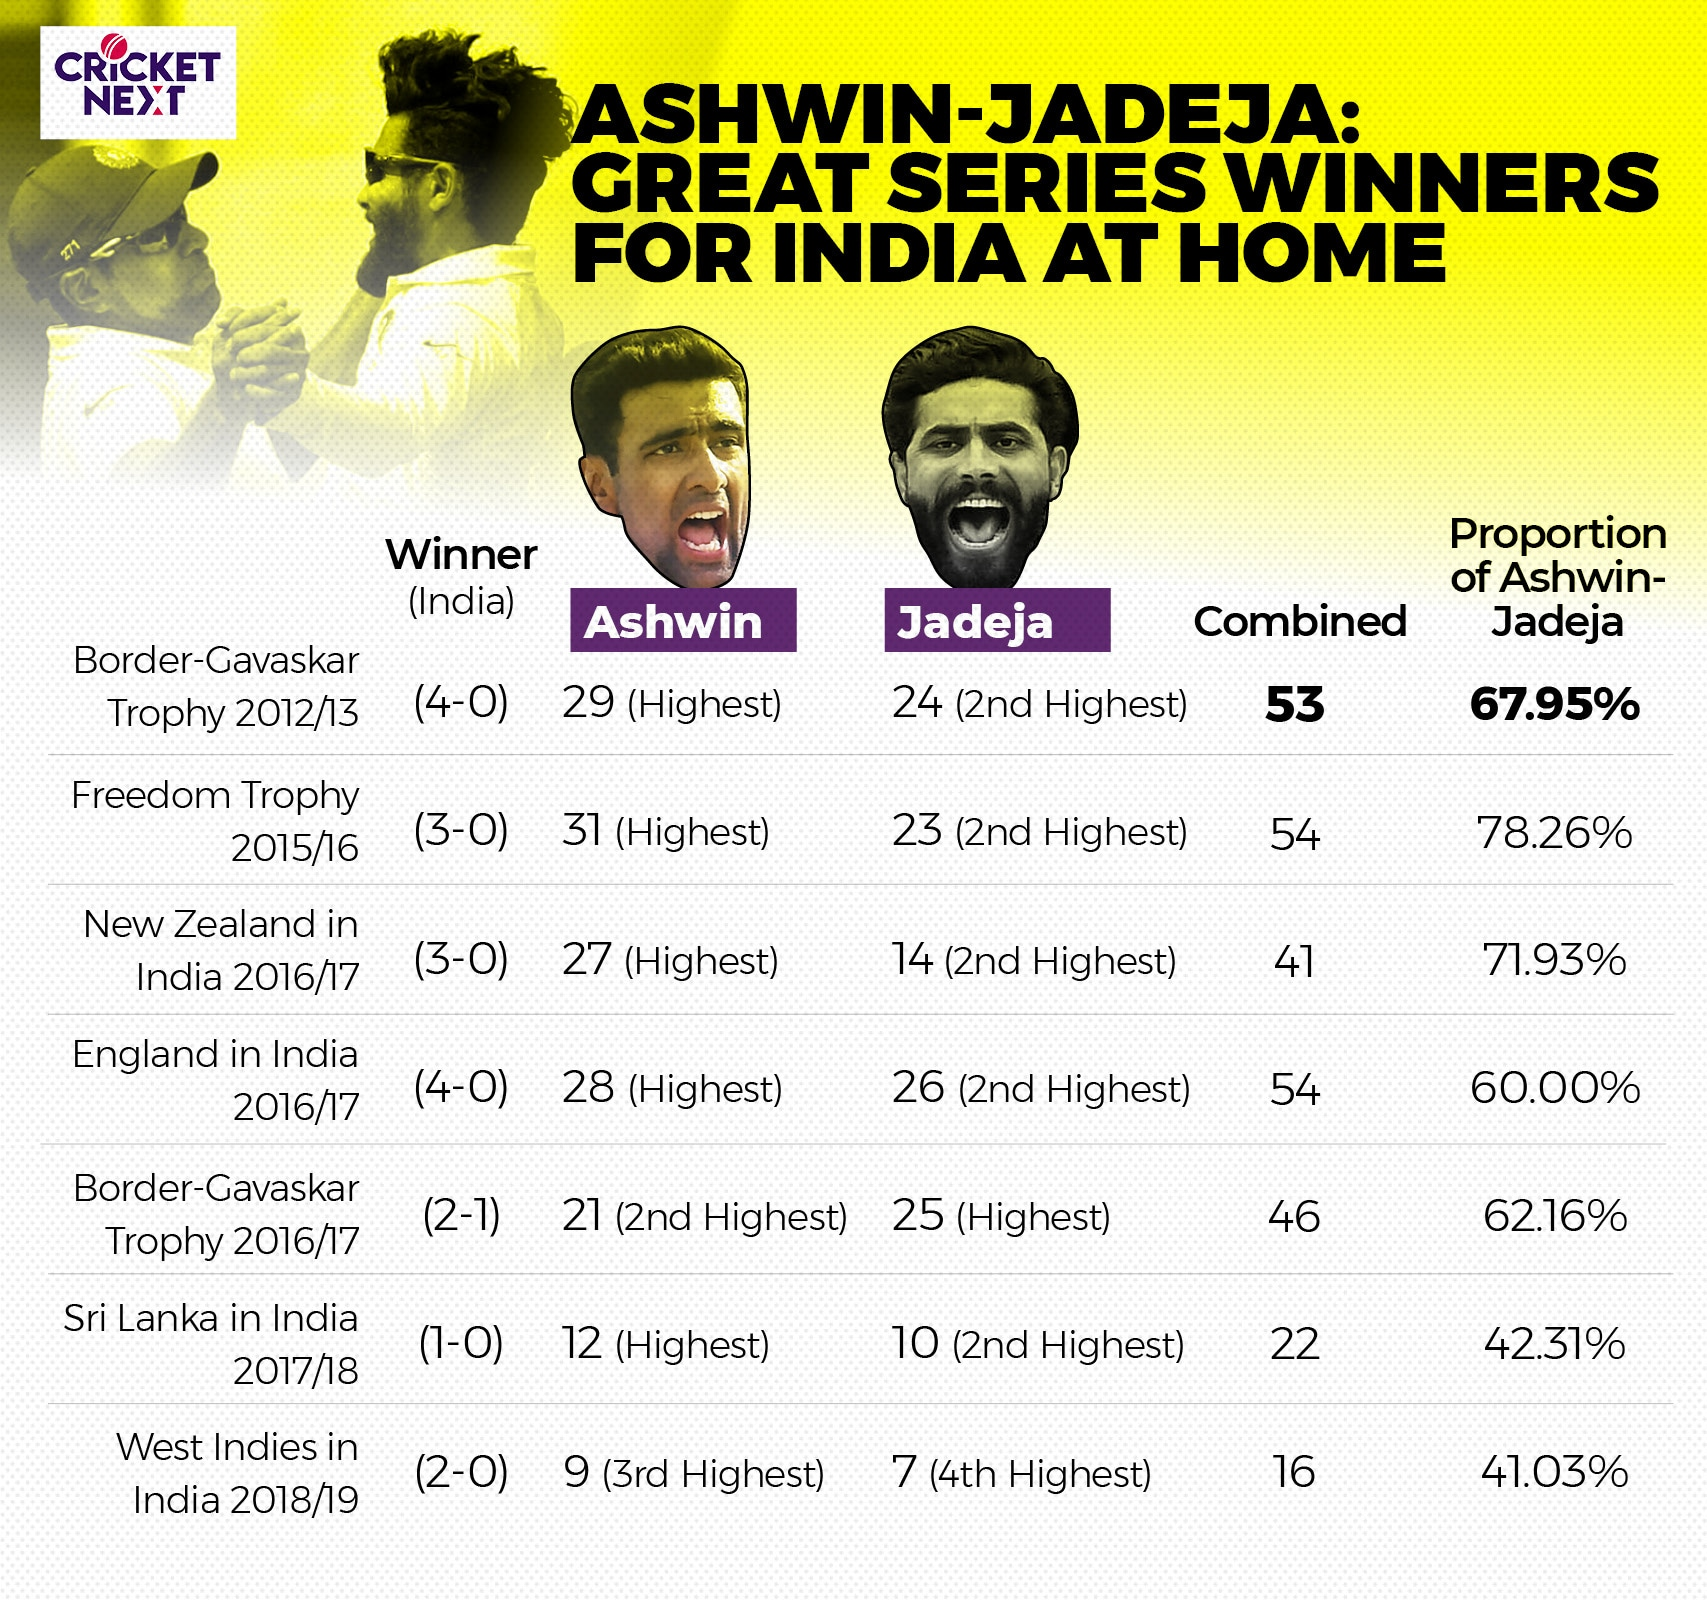 ASHWIN-JADEJA in INDIA4